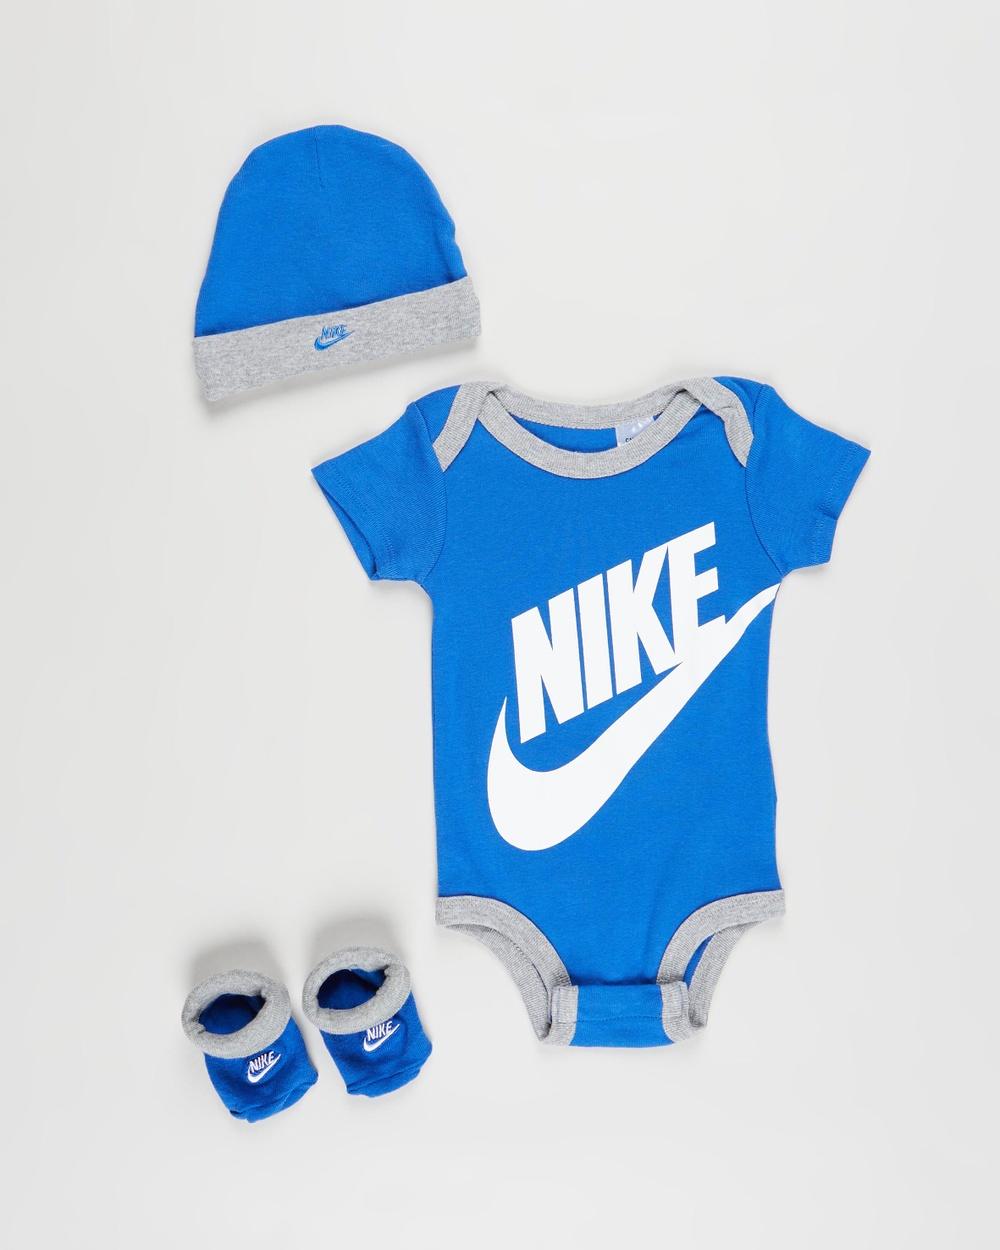 Nike Futura Logo Boxed Set Babies Headwear Blue